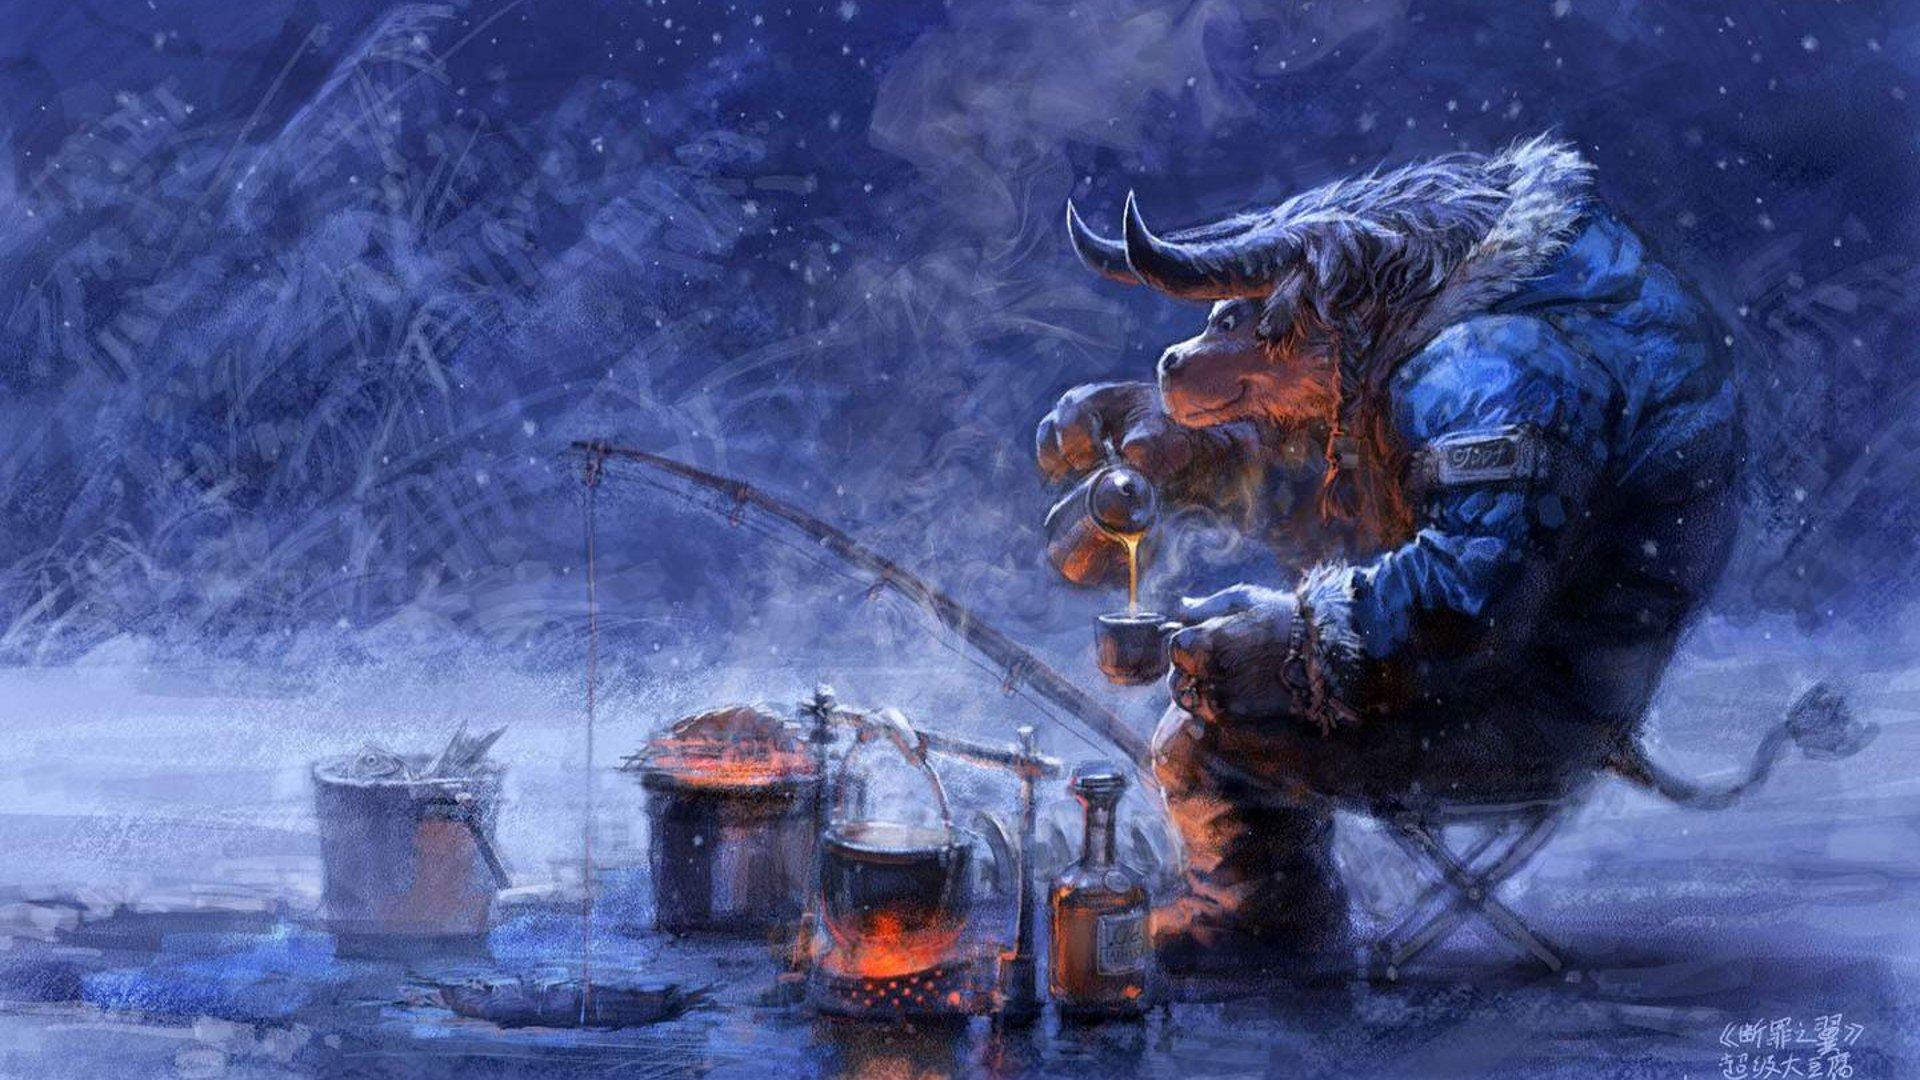 World of warcraft hd wallpaper background image - Wow tauren wallpaper ...